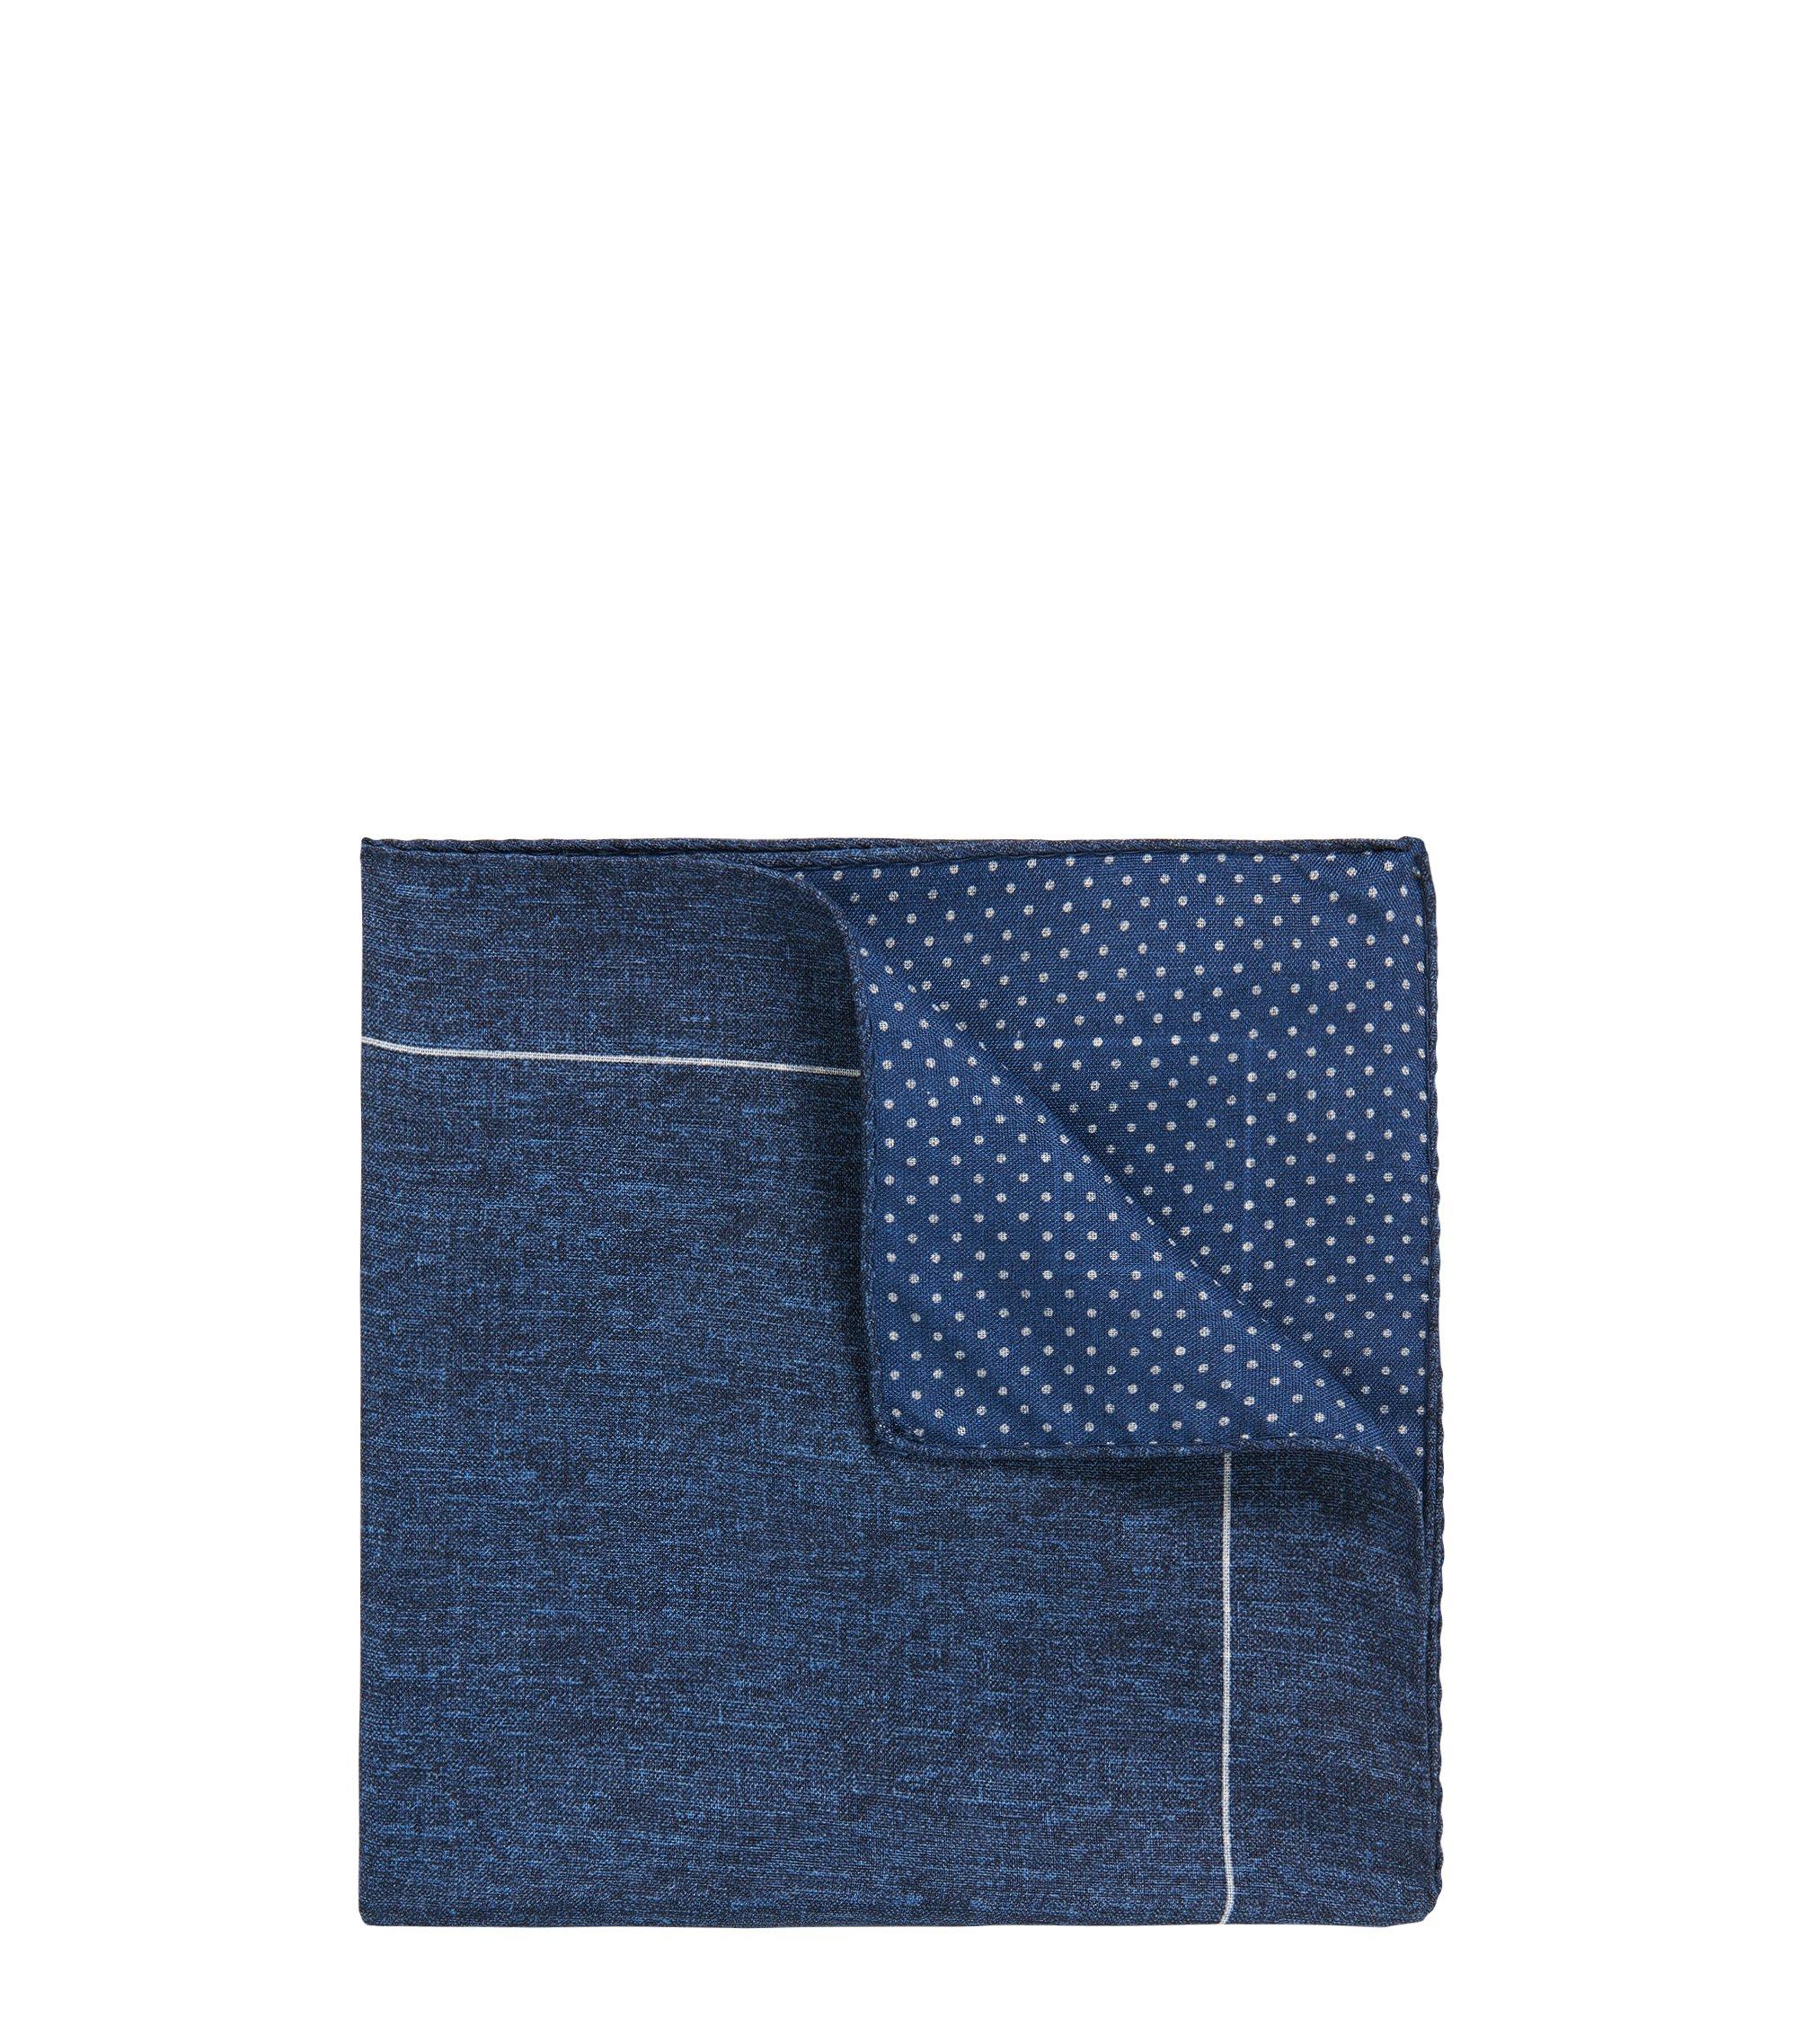 Polka Dot Reverse Silk Pocket Square, Dark Blue